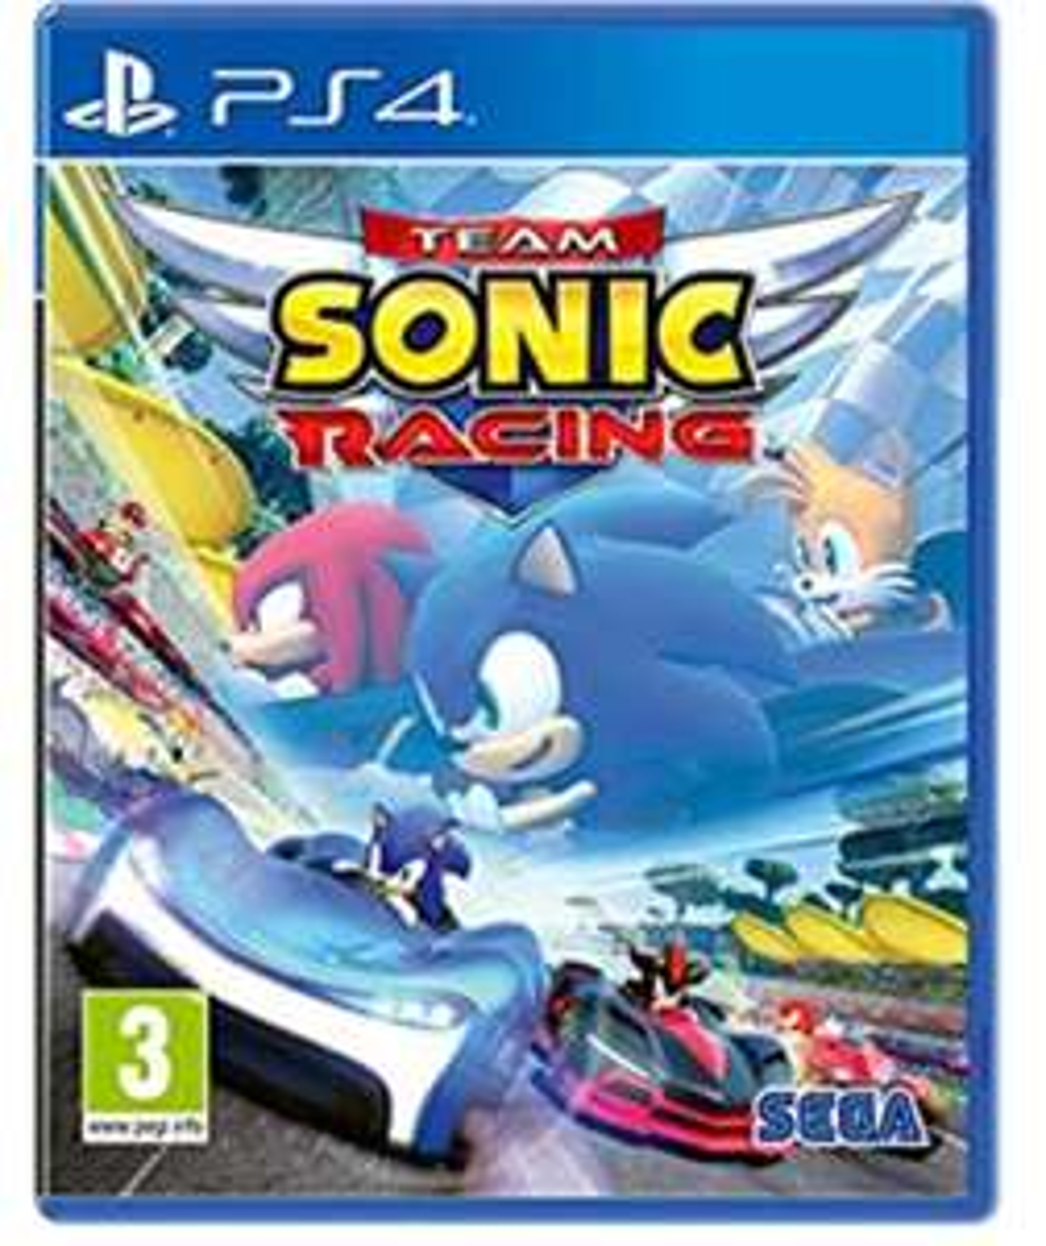 Team Sonic Racing sur PS4